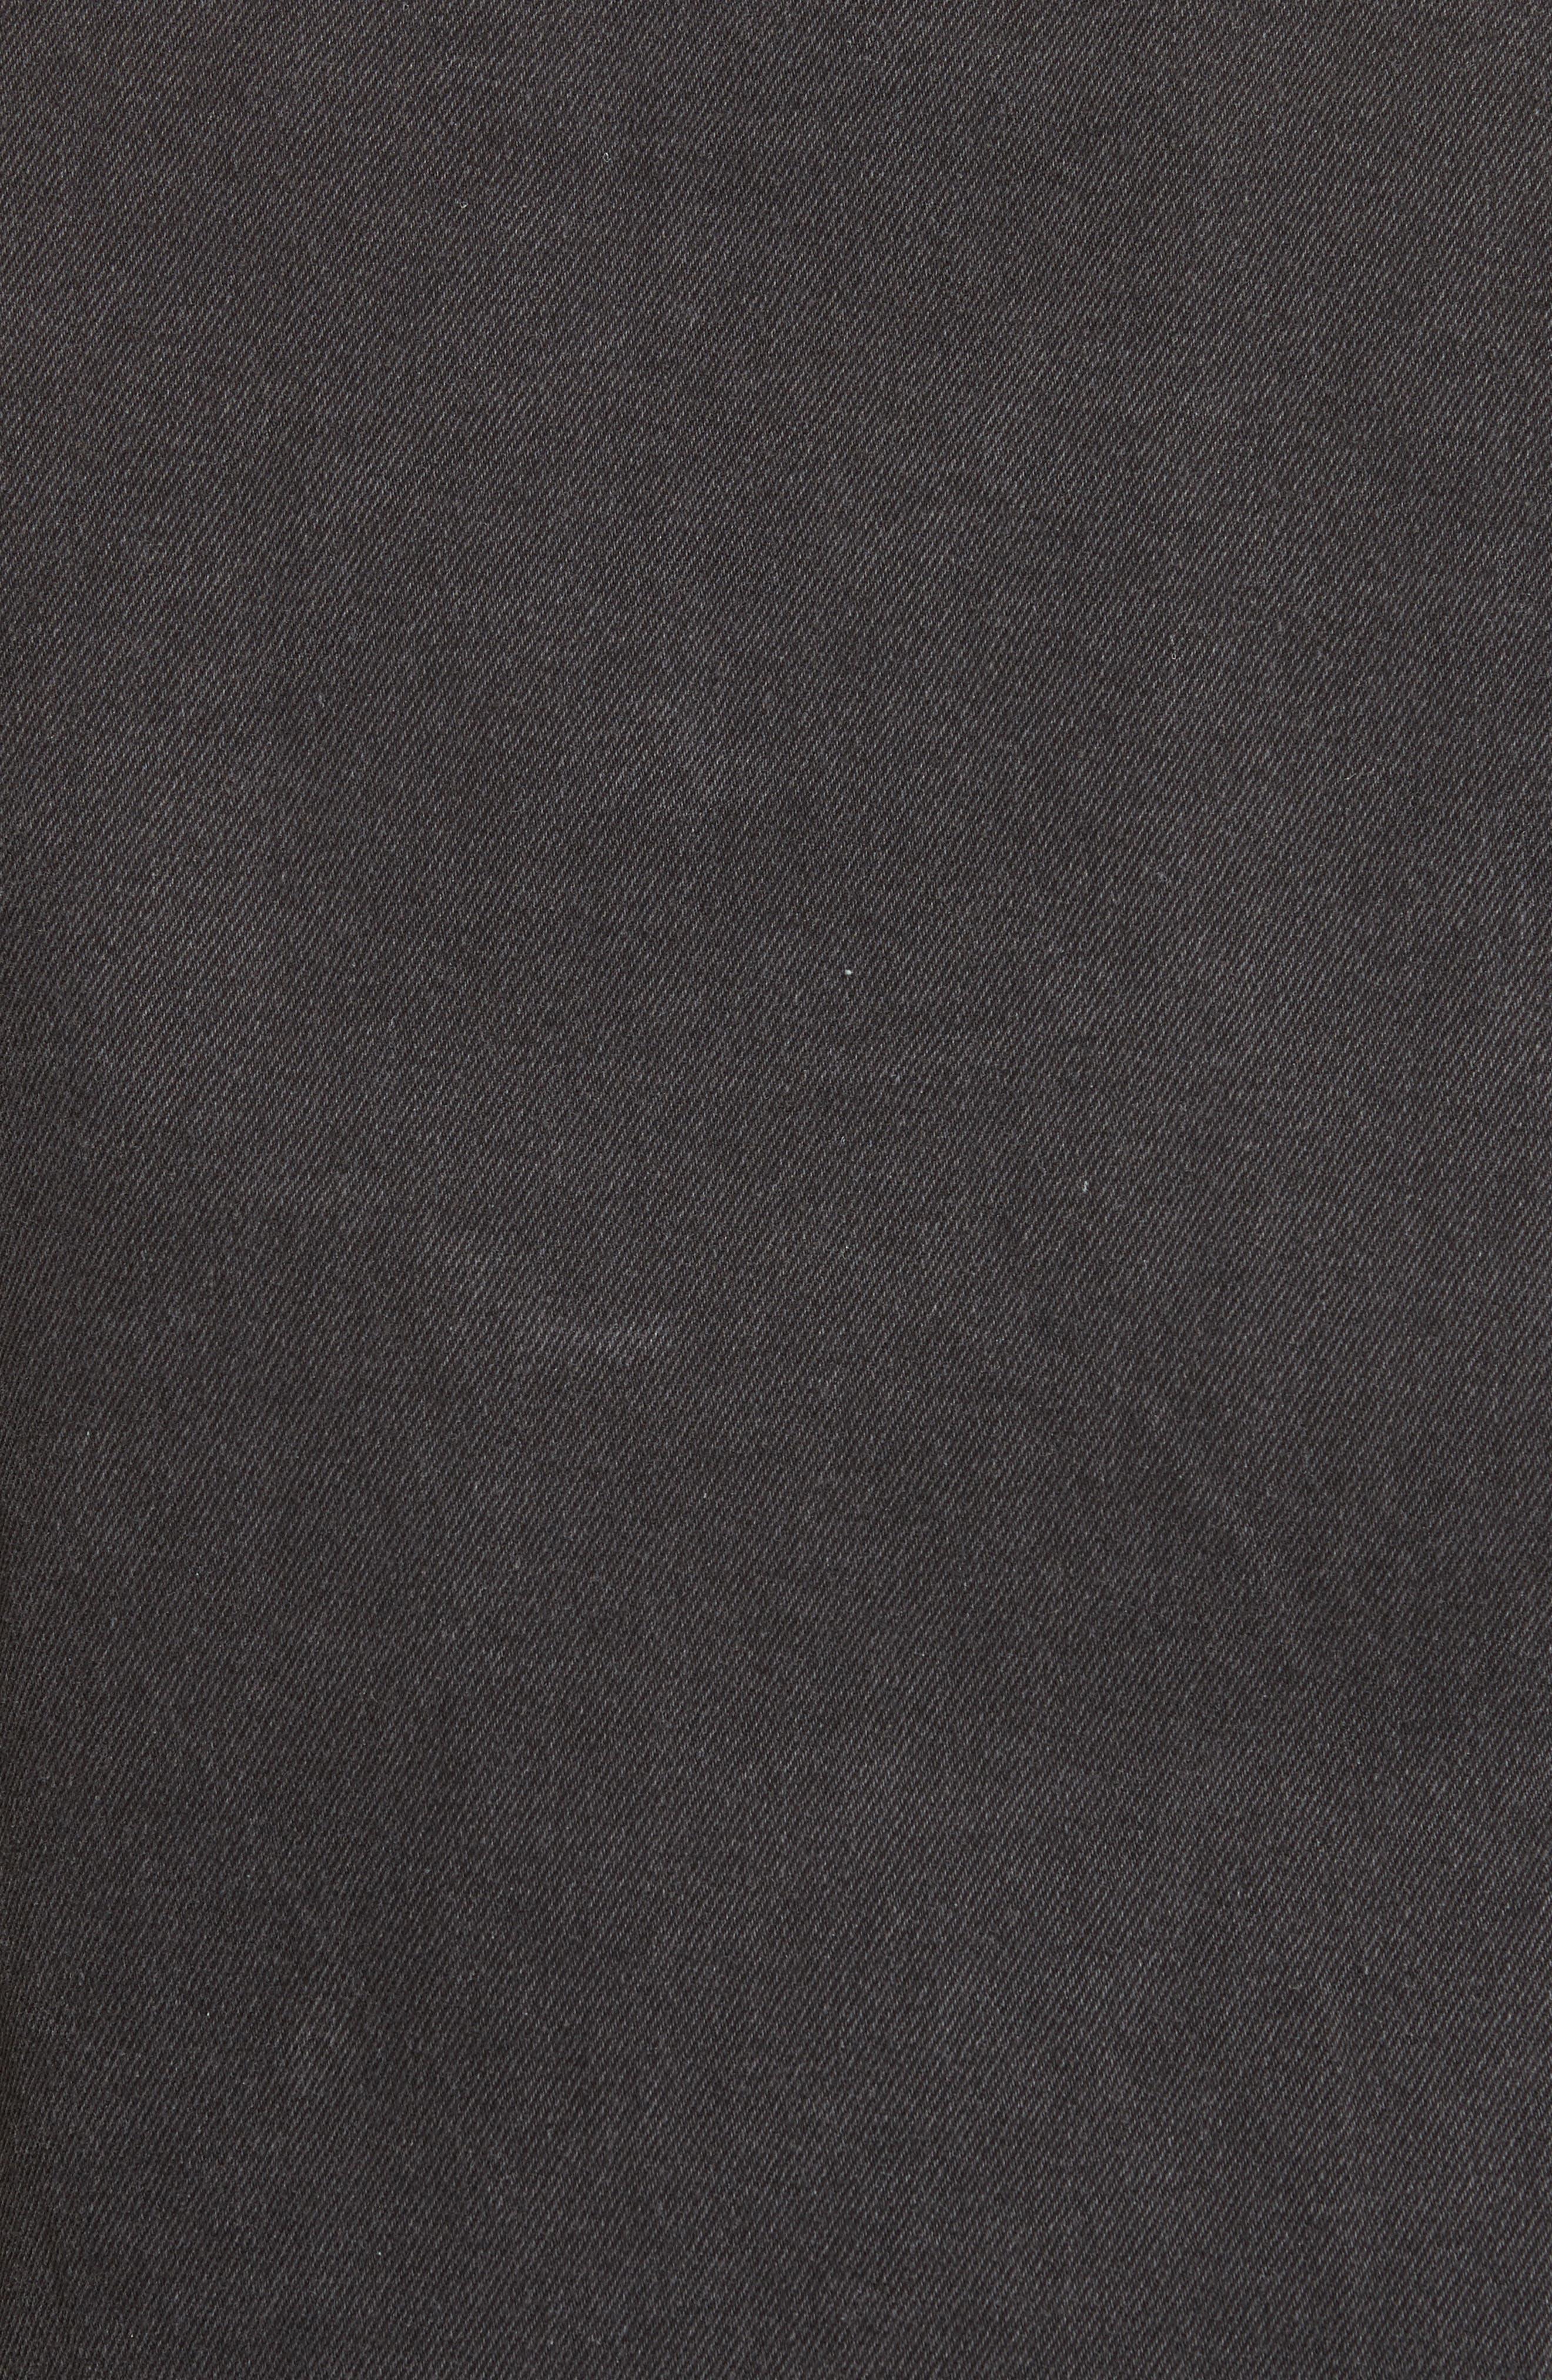 Classic Denim Jacket,                             Alternate thumbnail 5, color,                             Black